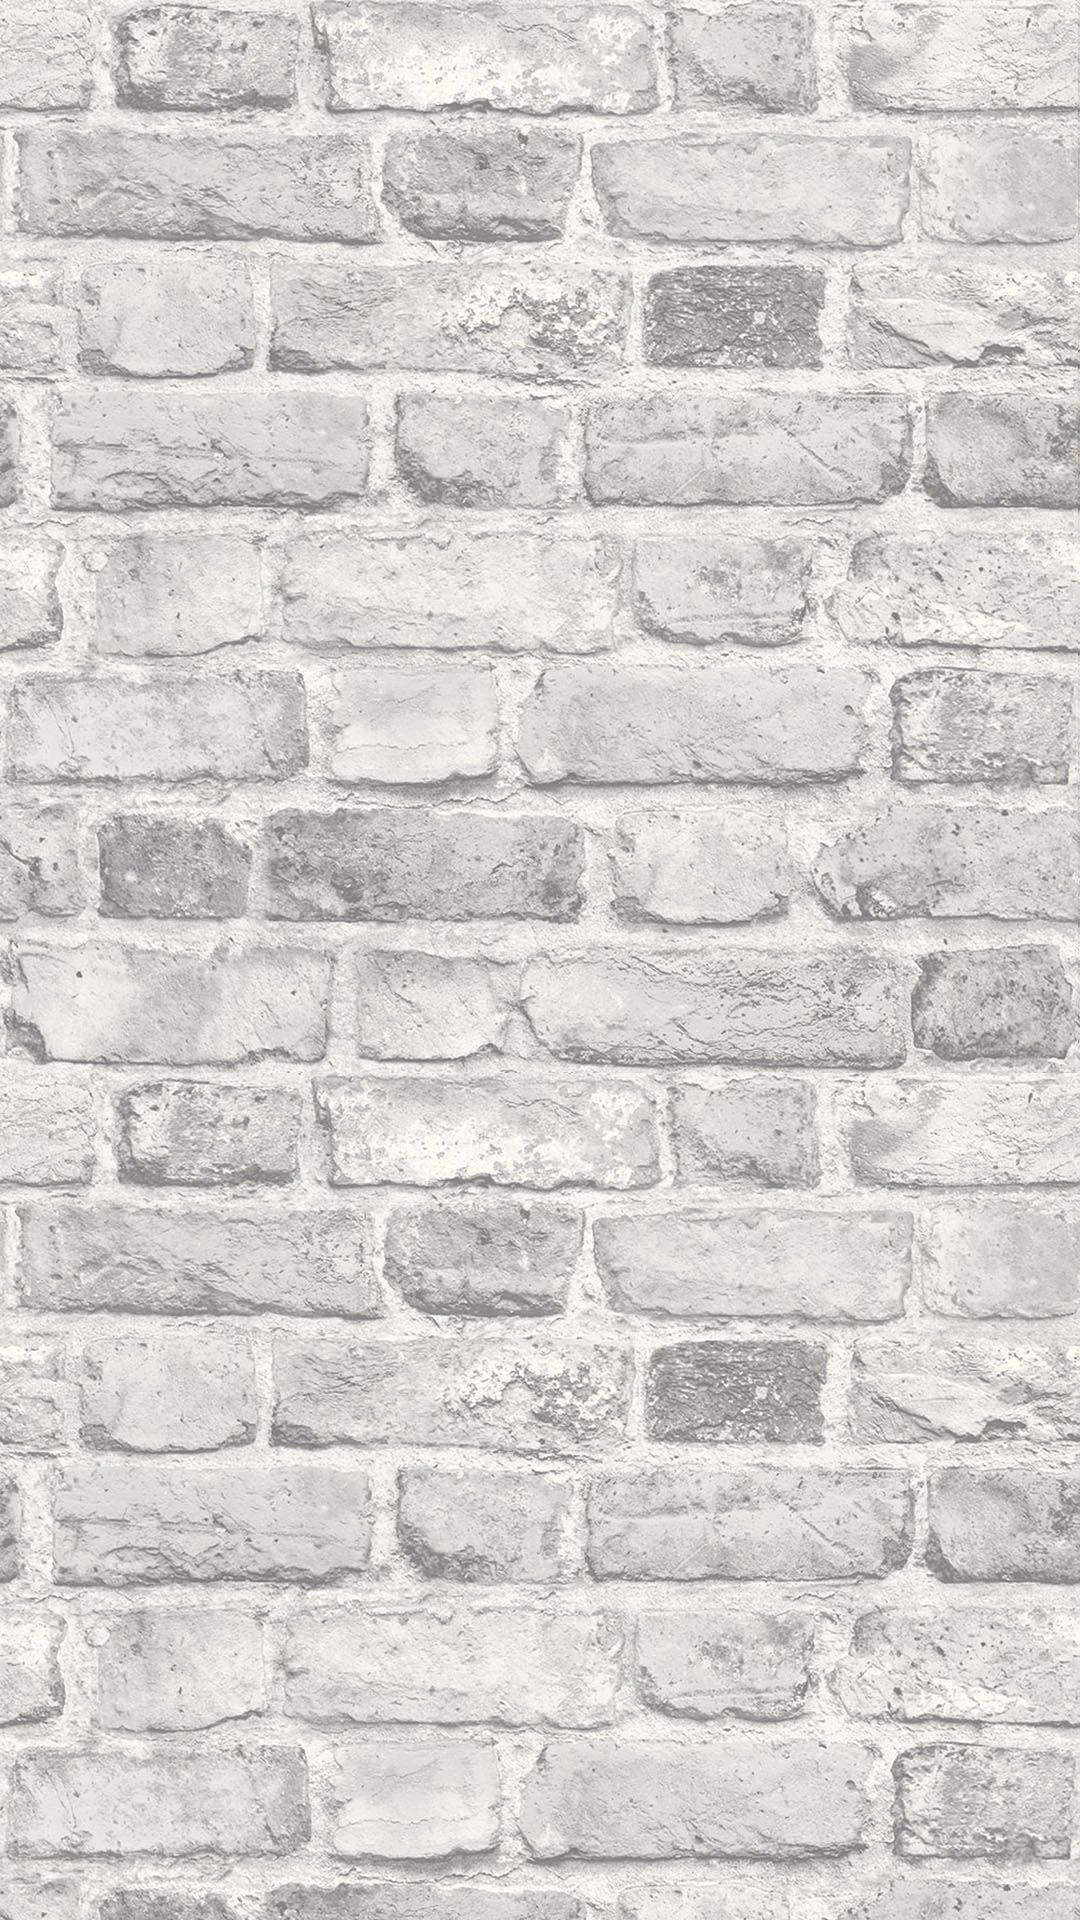 The Battersea Brick Effect Wallpaper From I Love Wallpaper A Beautiful Industrial Textured Bri Brick Wallpaper Bedroom Brick Wallpaper Brick Effect Wallpaper